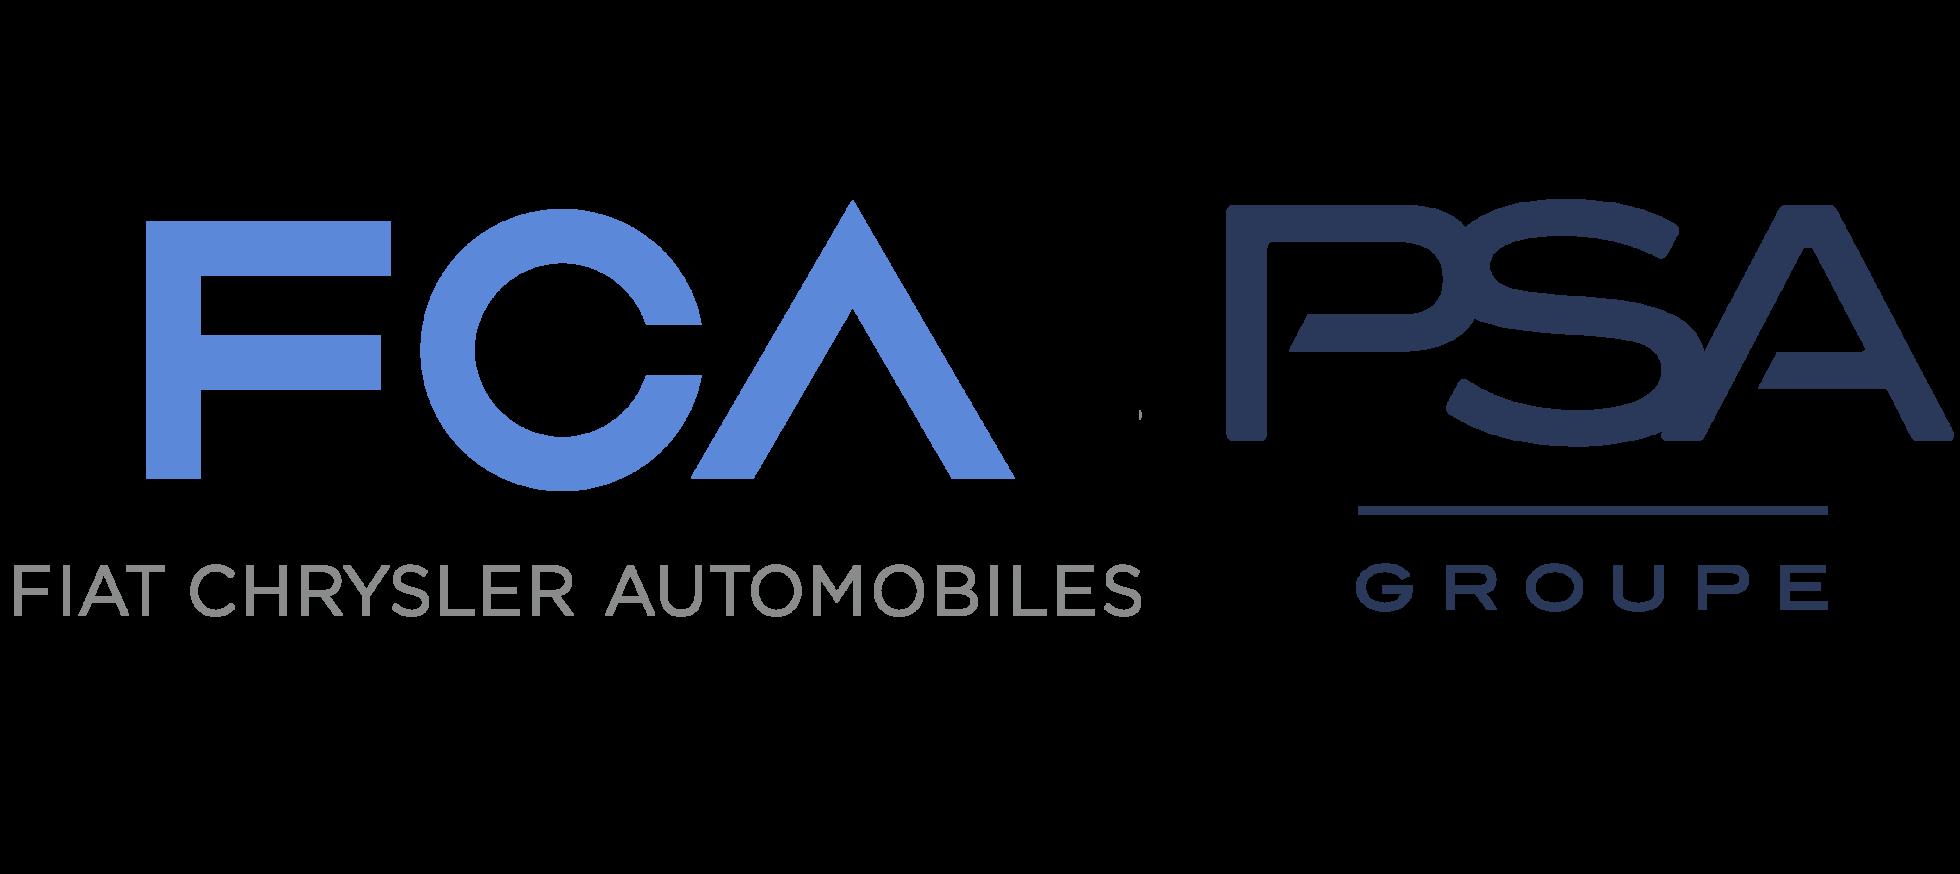 Stellantis: fusione tra Fiat Chrysler Automobiles e Groupe PSA (Peugeot)